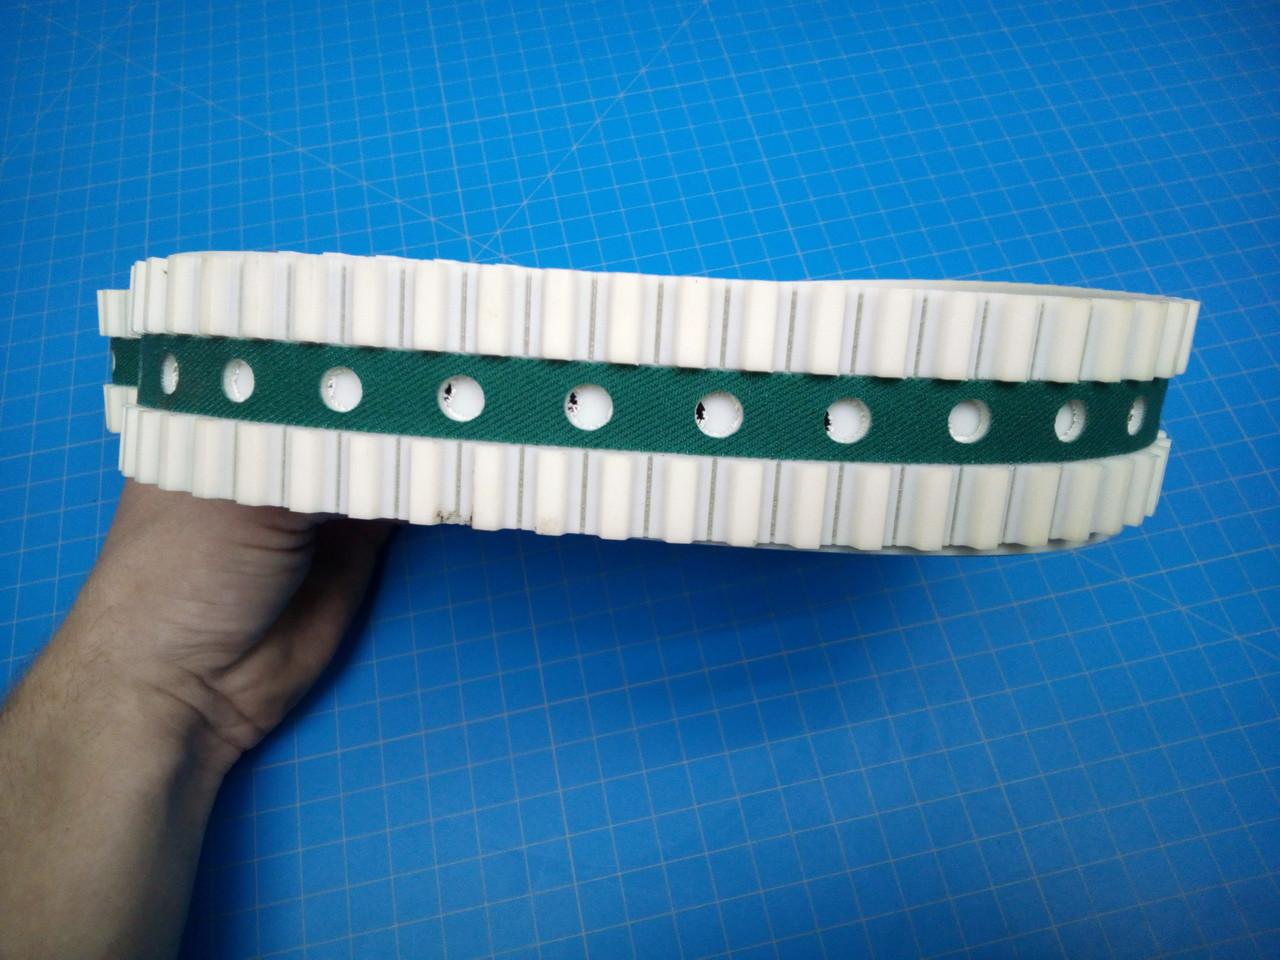 "H&H Vacuum Transport Mail Table 1 5/8"" x 6800mm Belts - P01-000033"